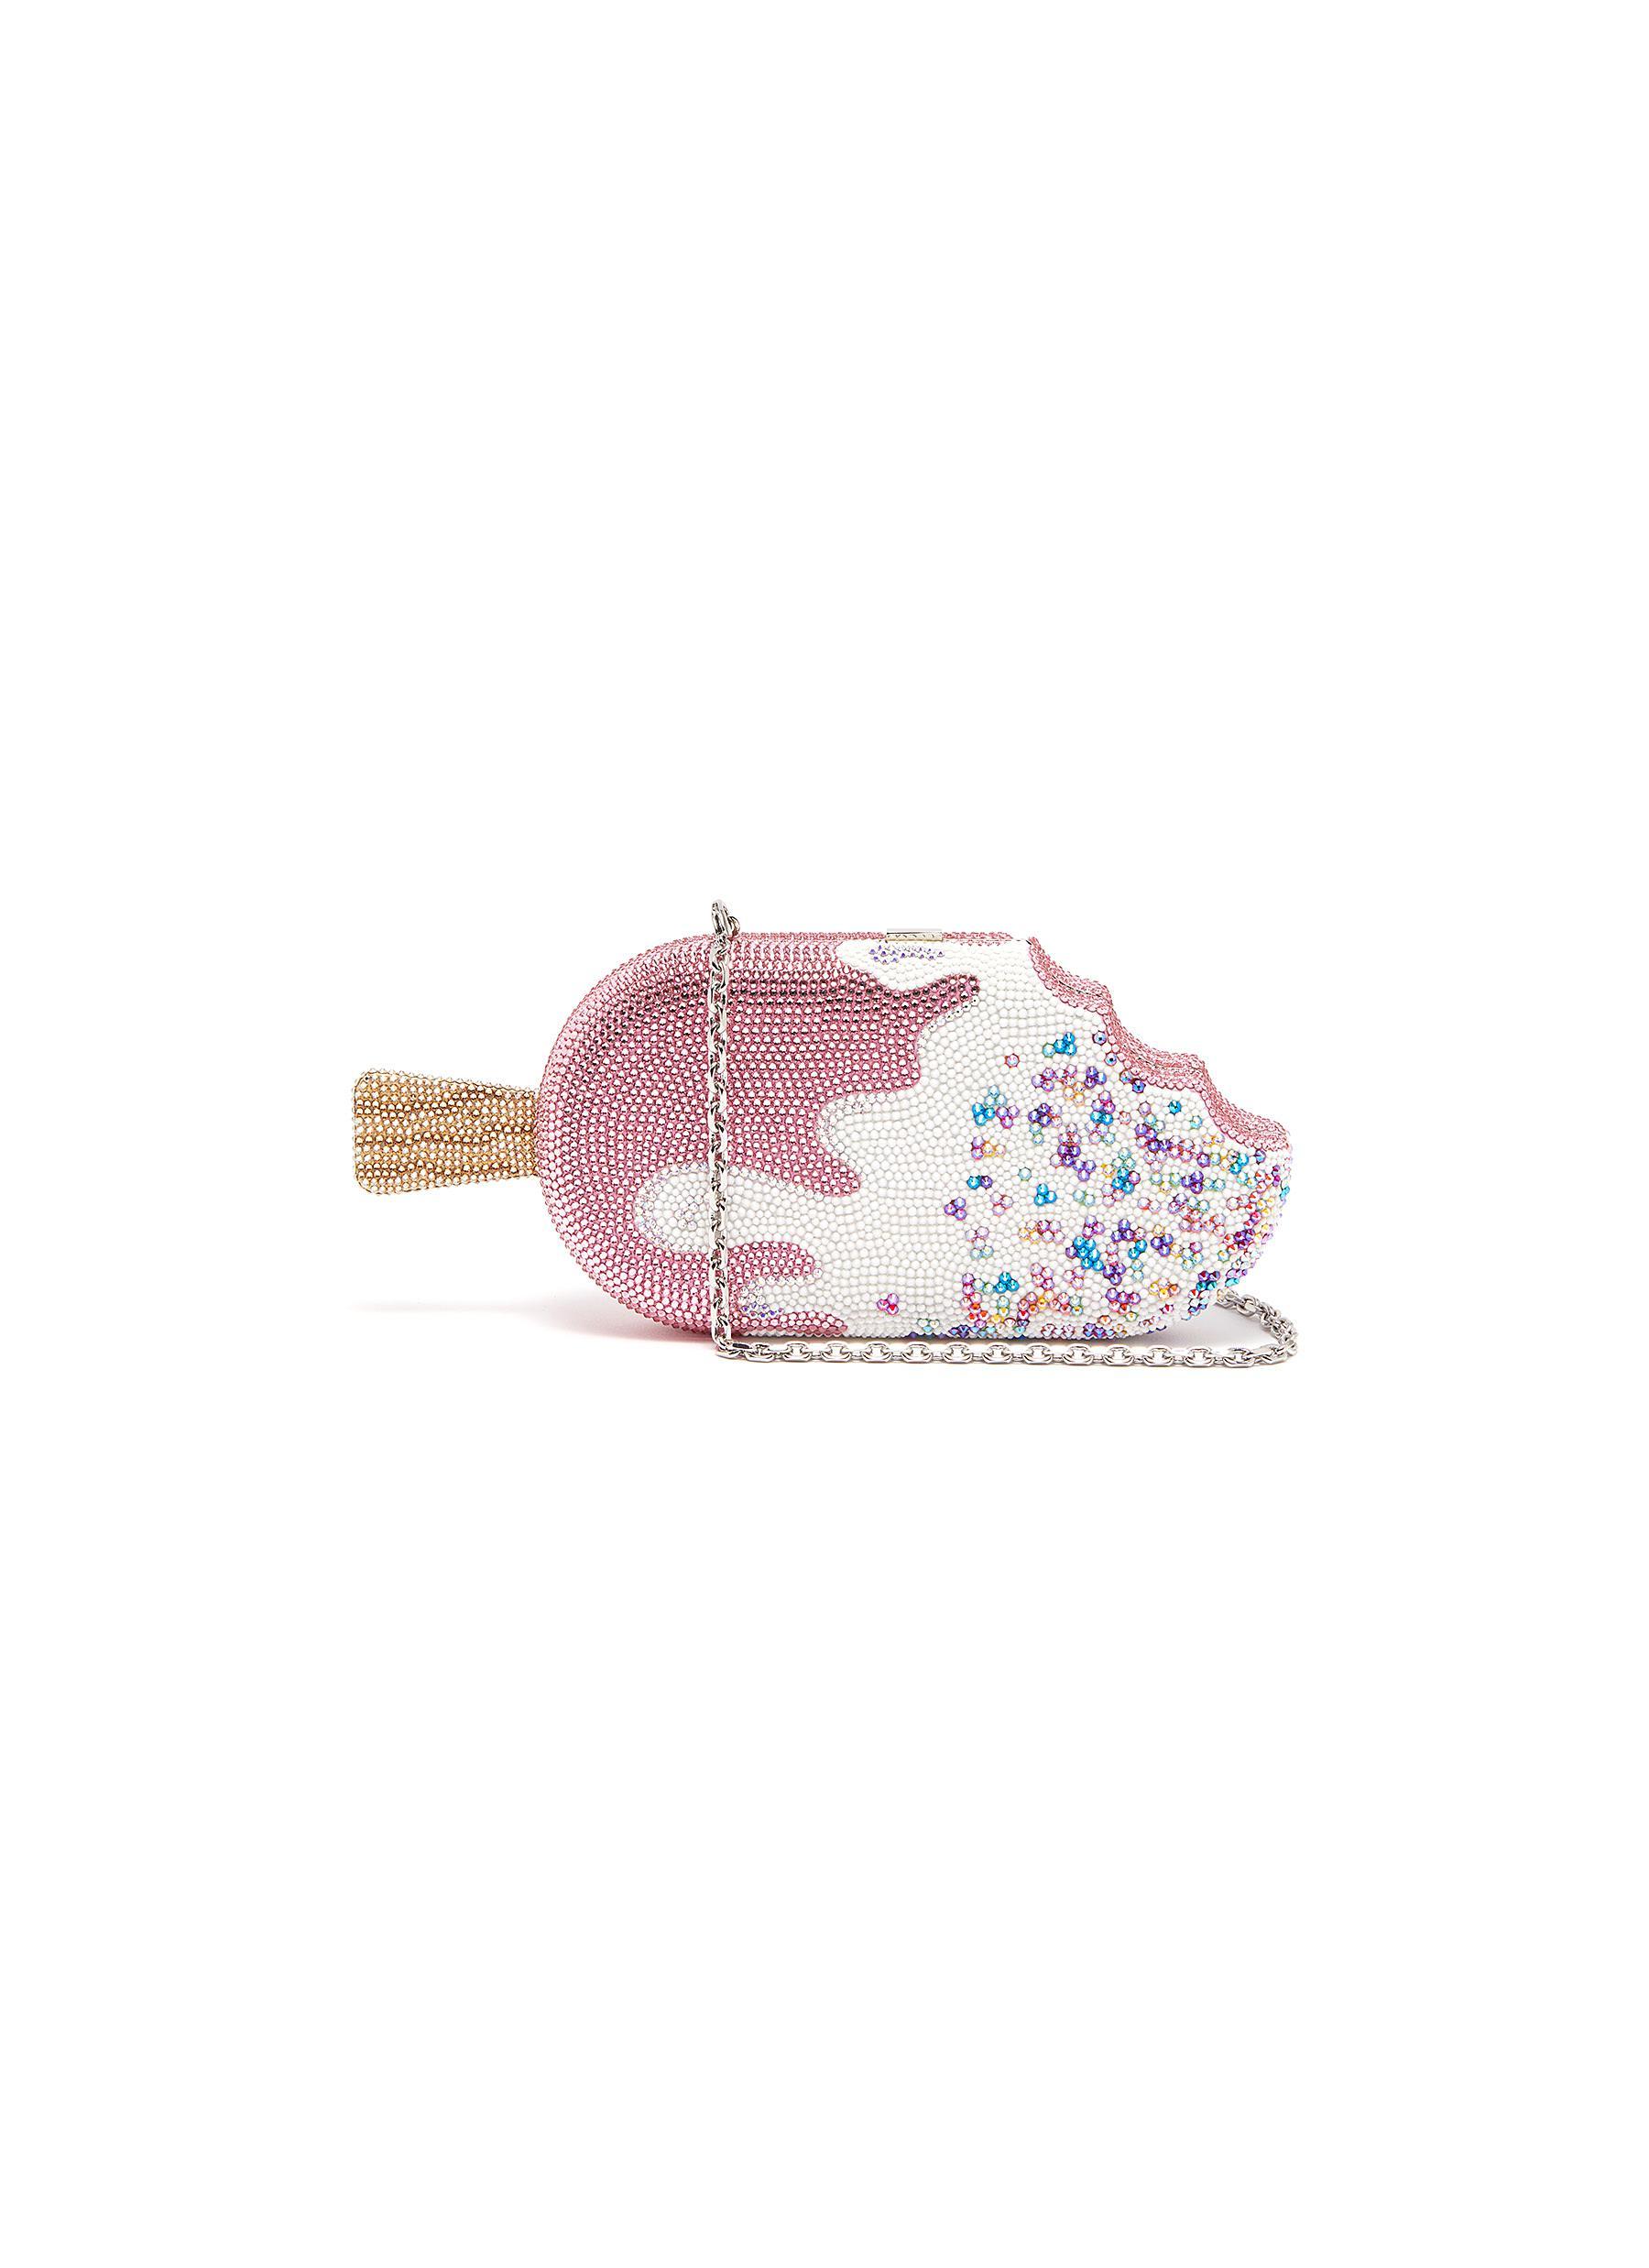 Judith Leiber Bags Strawberry drip popsicle crystal pavé minaudière